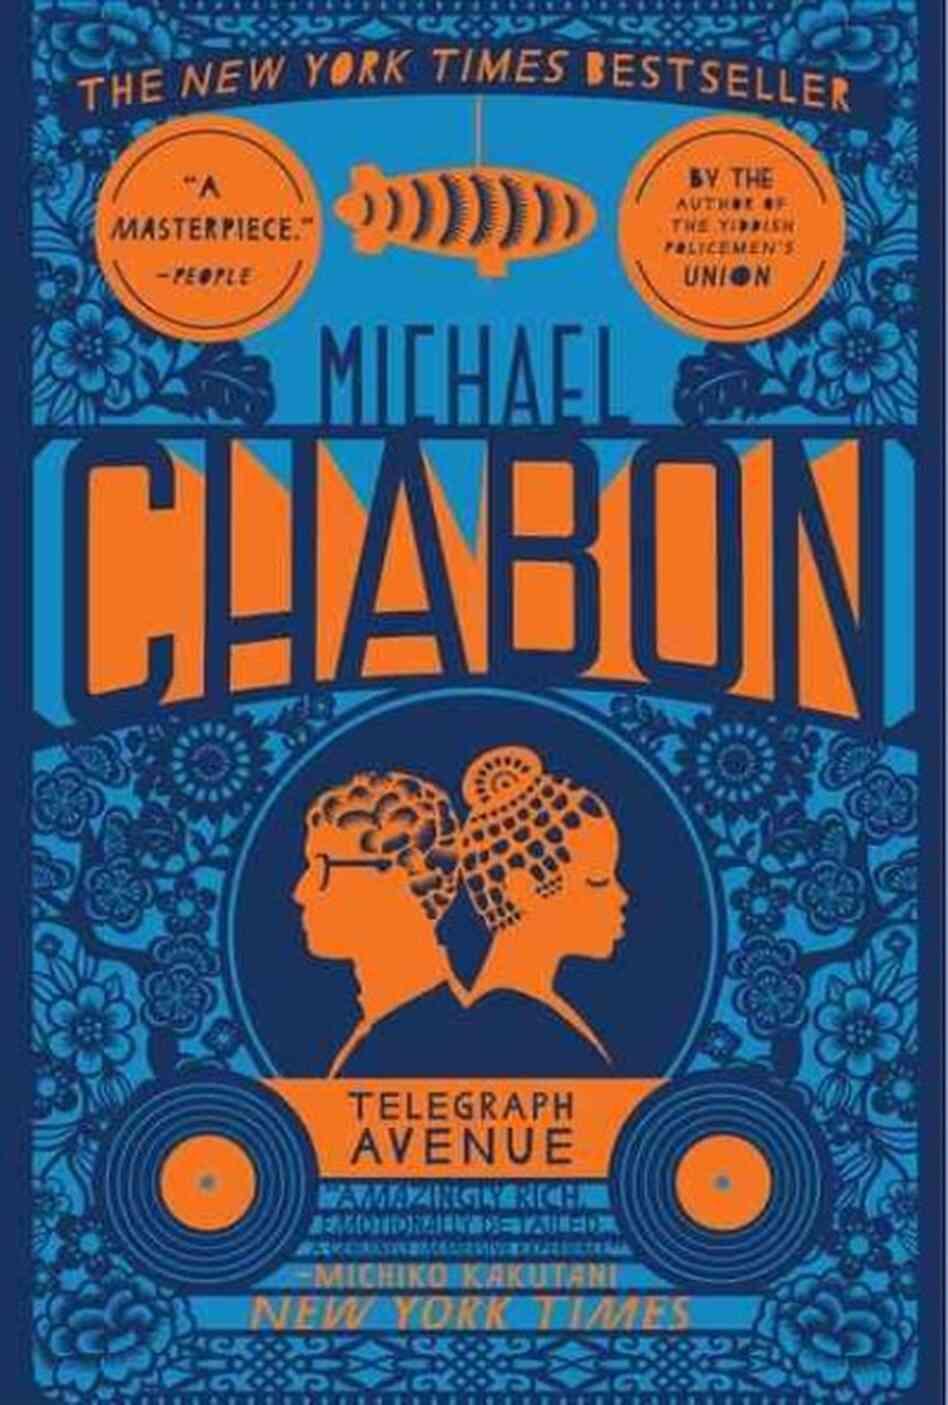 Pin by Brunna Mancuso on Design — Michael chabon, Books